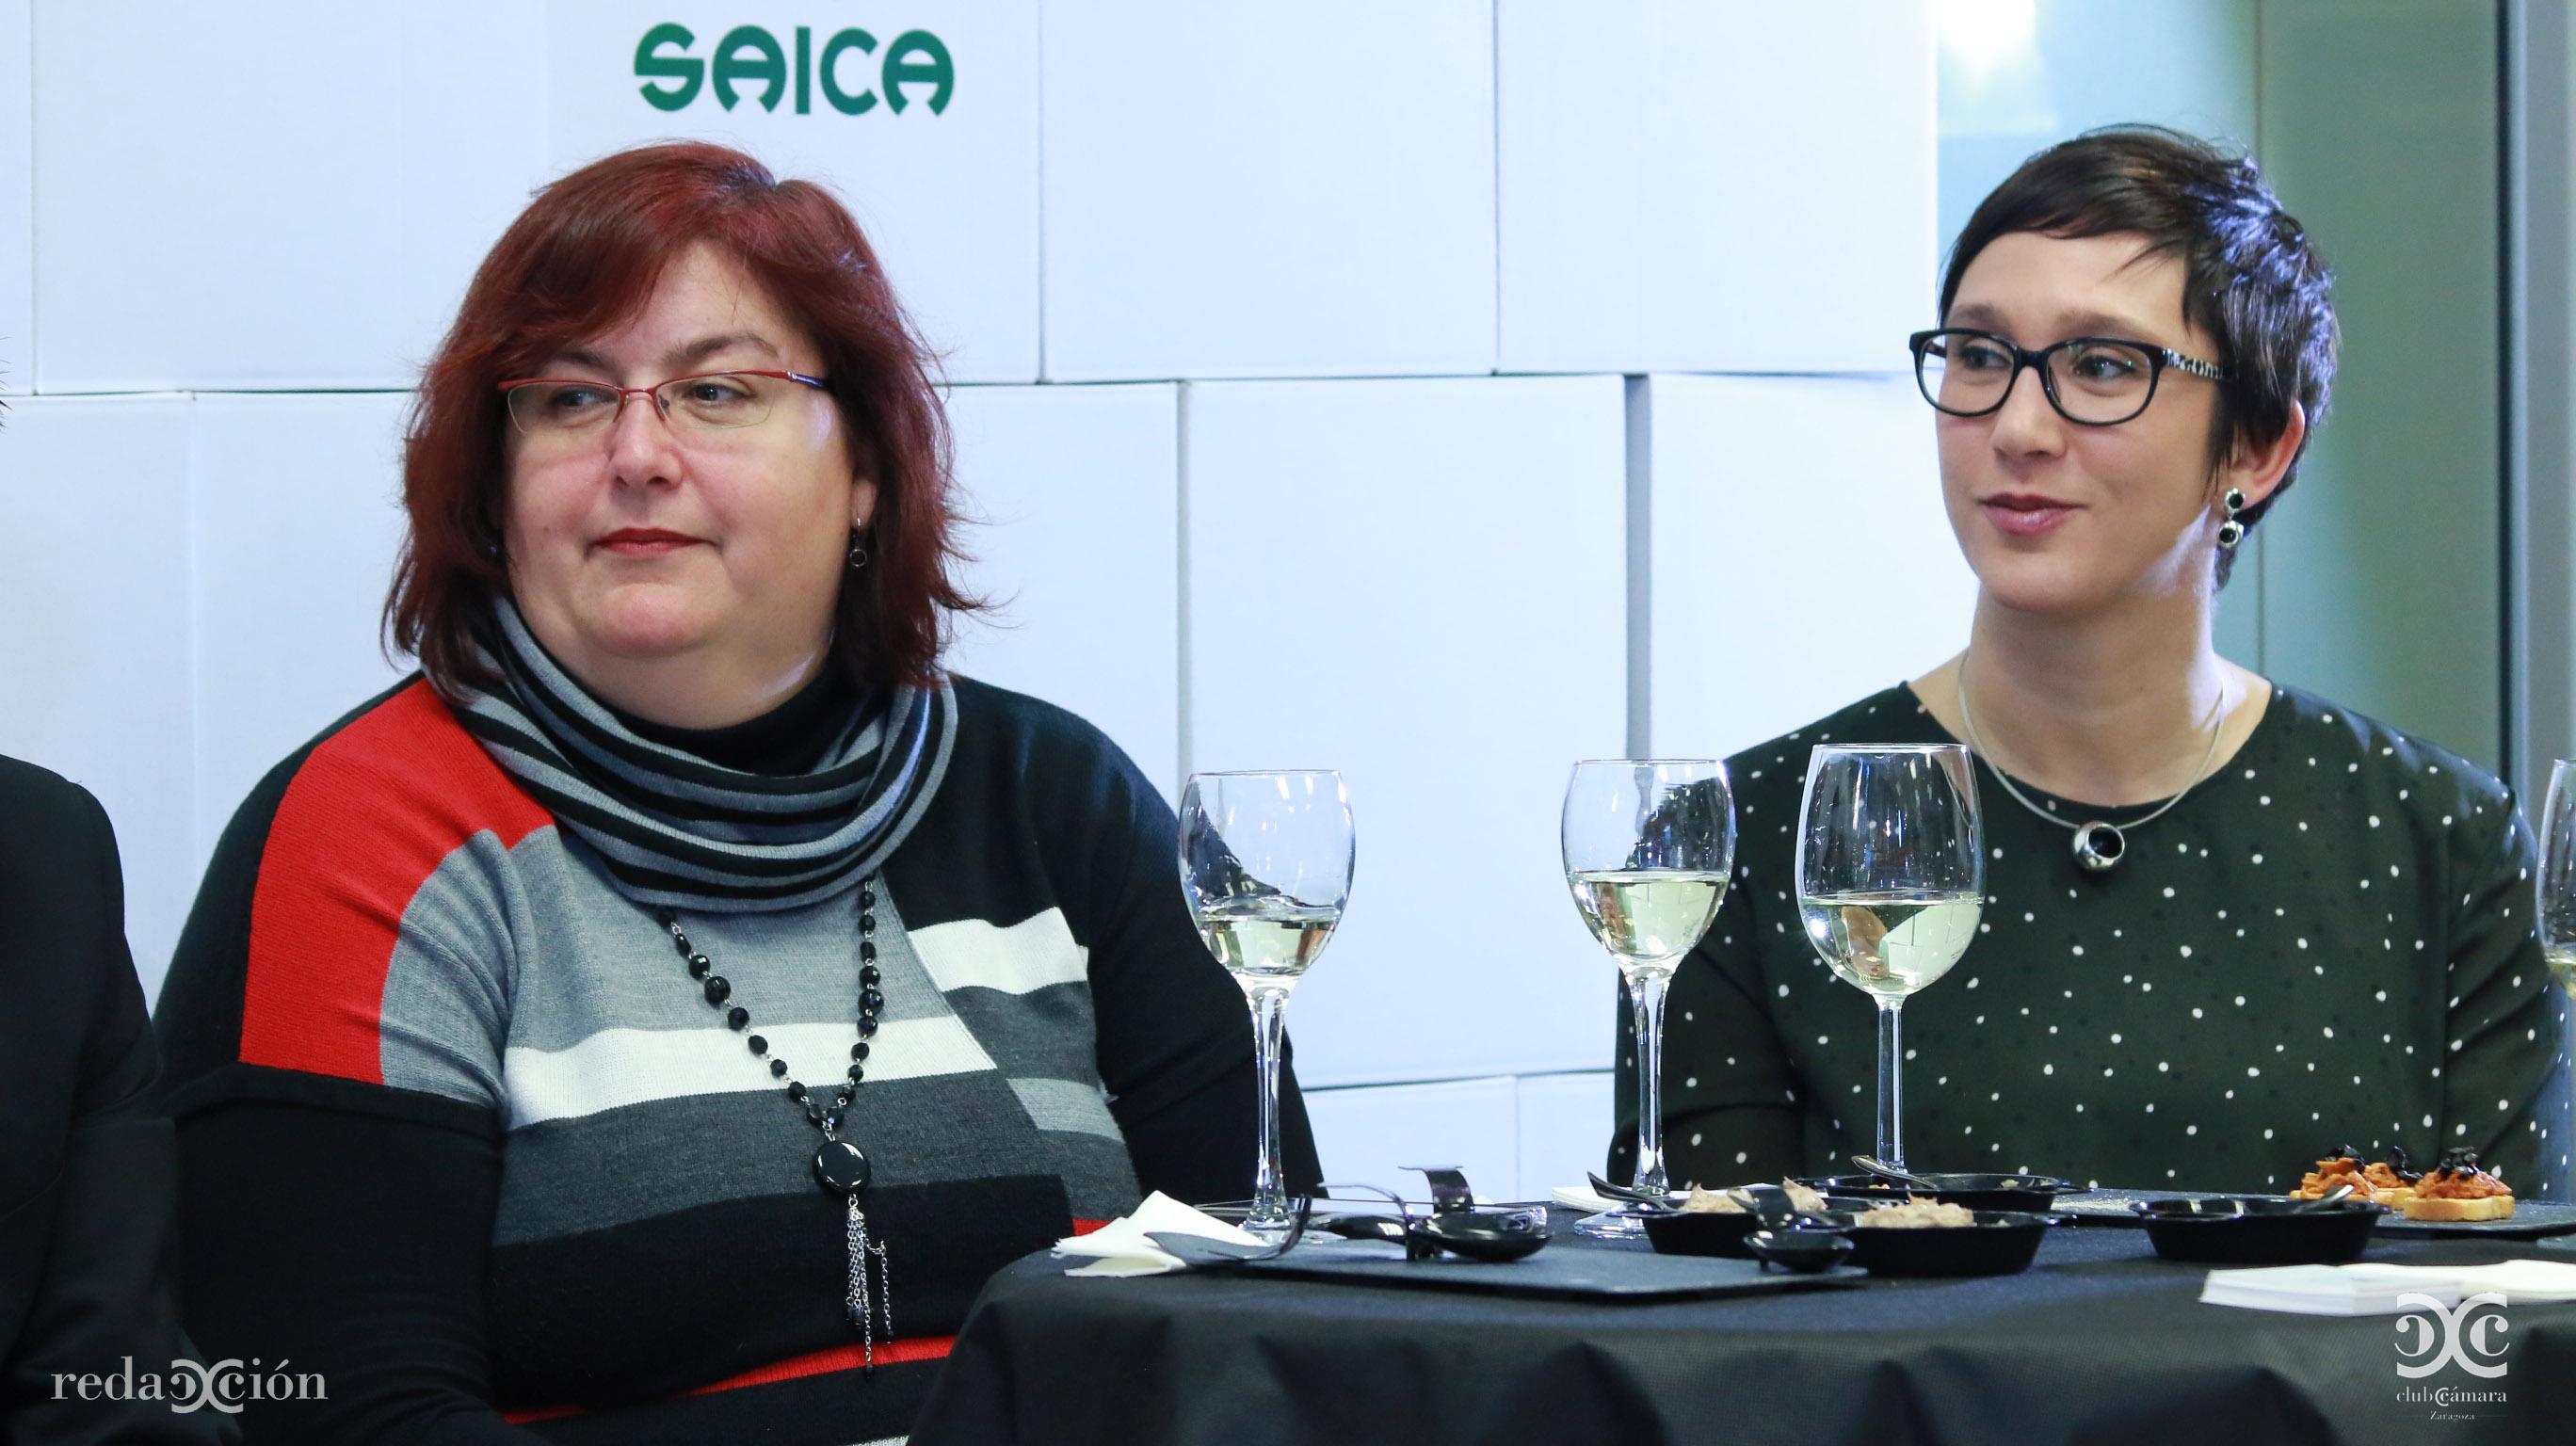 Inmaculada Martínez y Mónica Núñez